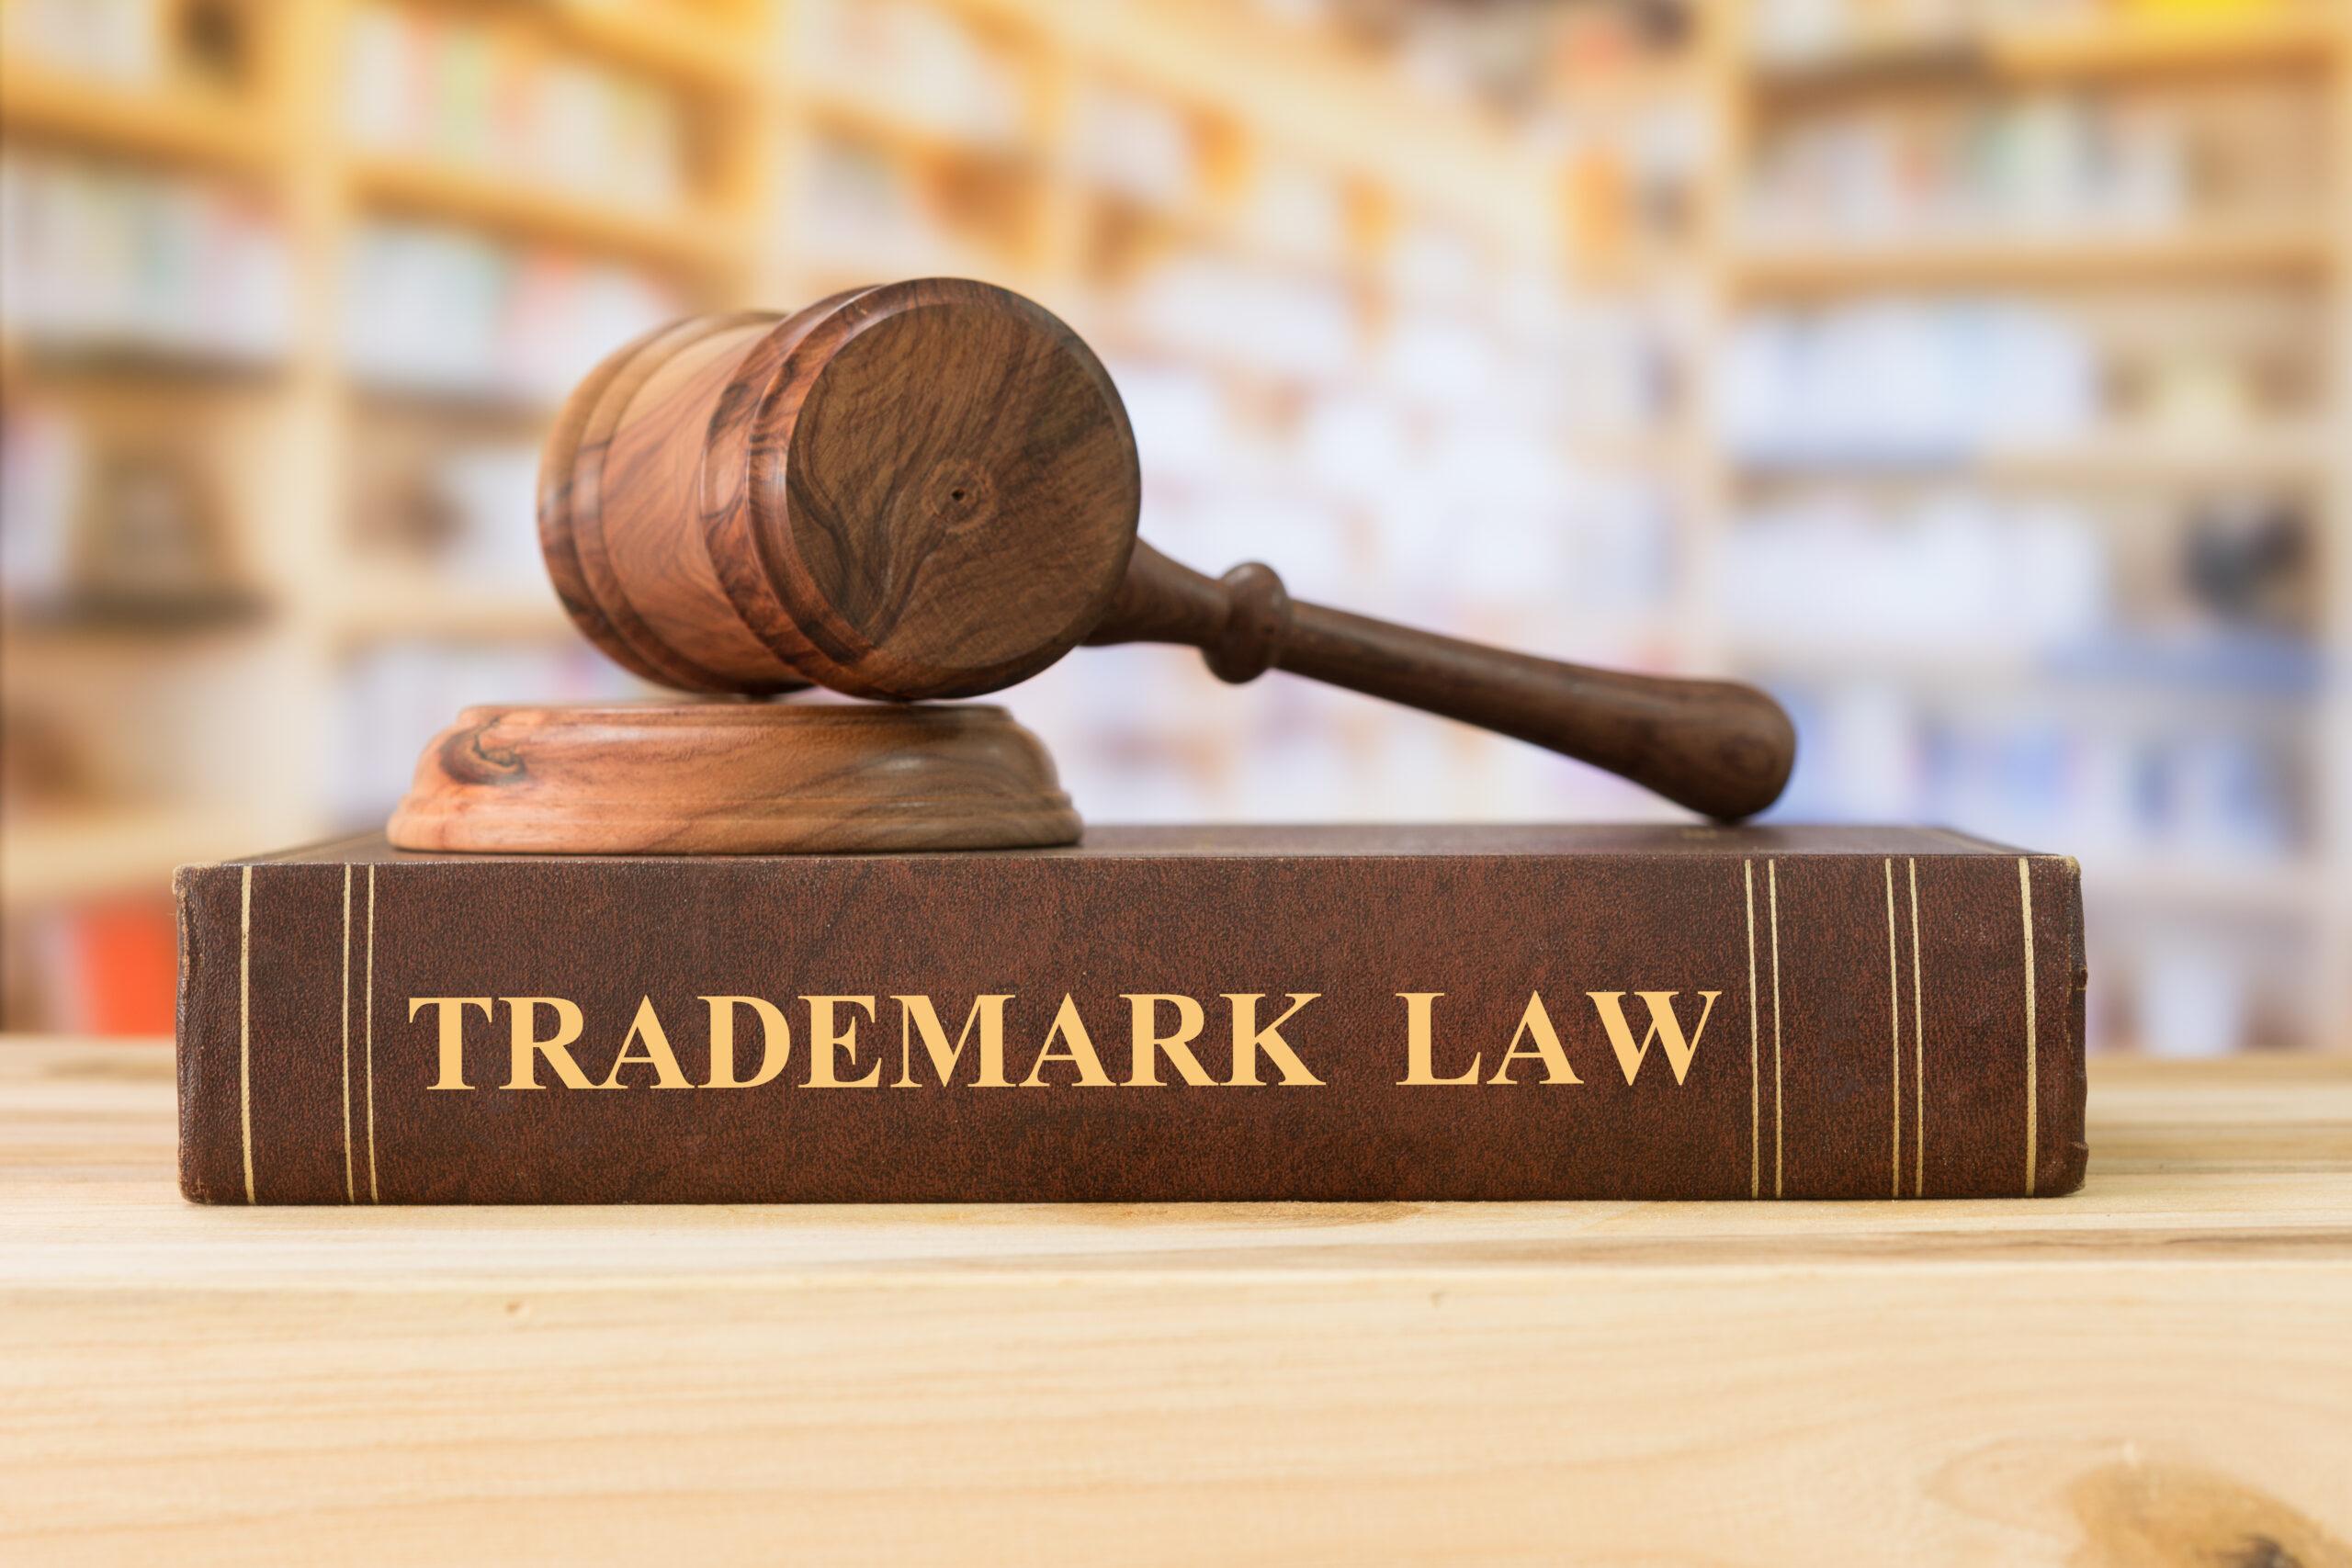 Should I register a trade mark for my start-up business?